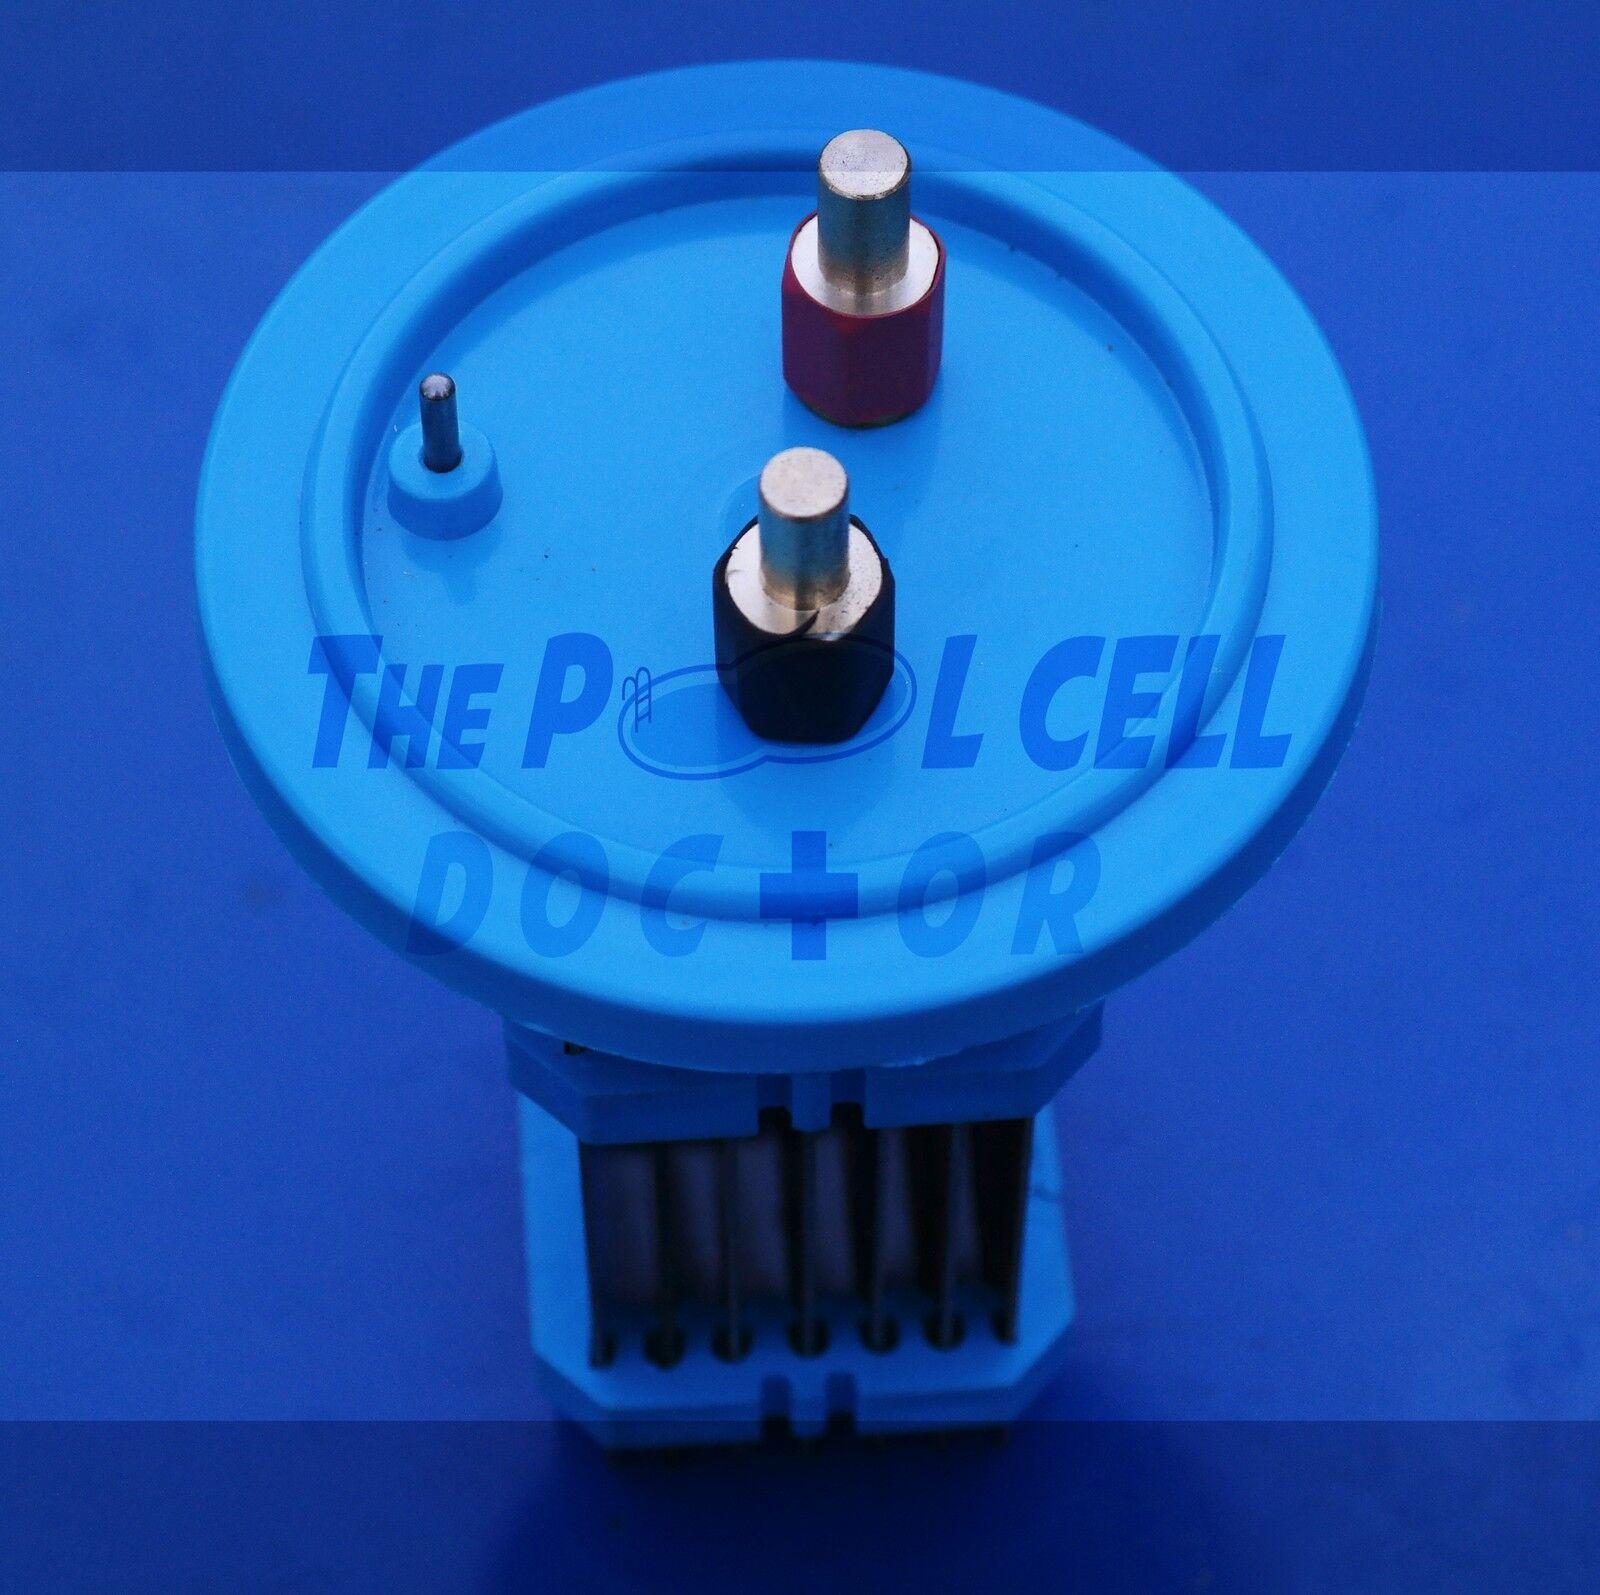 AUTOCLEAR S200 piscina Sal Celular Genérico electrodo estándar de 2 ywty Hvyduty EXPRESS